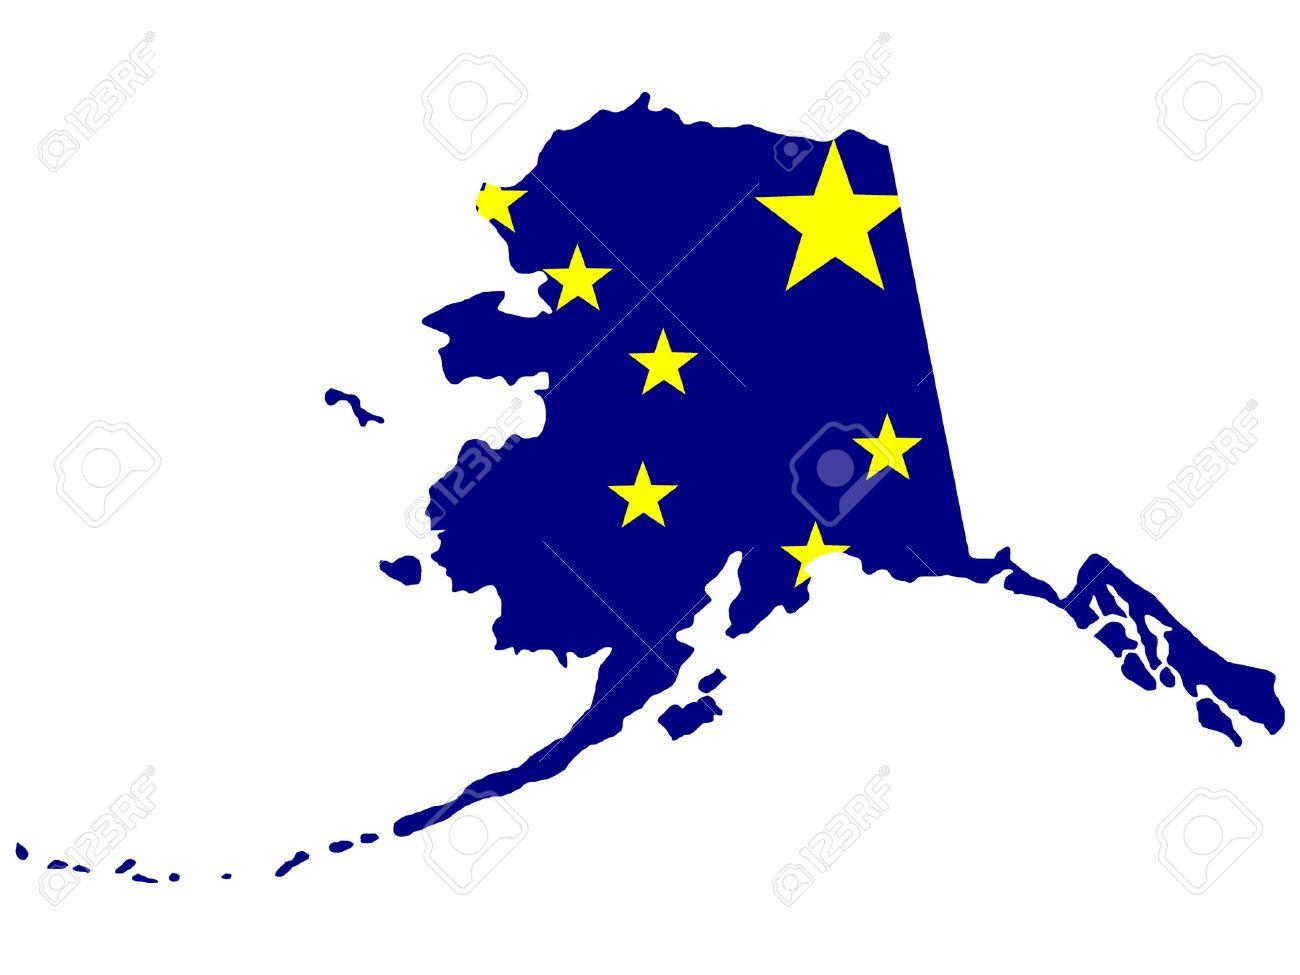 Alaska Maps Perry CastaÃeda Map Methods Of Total Quality - State of alaska map